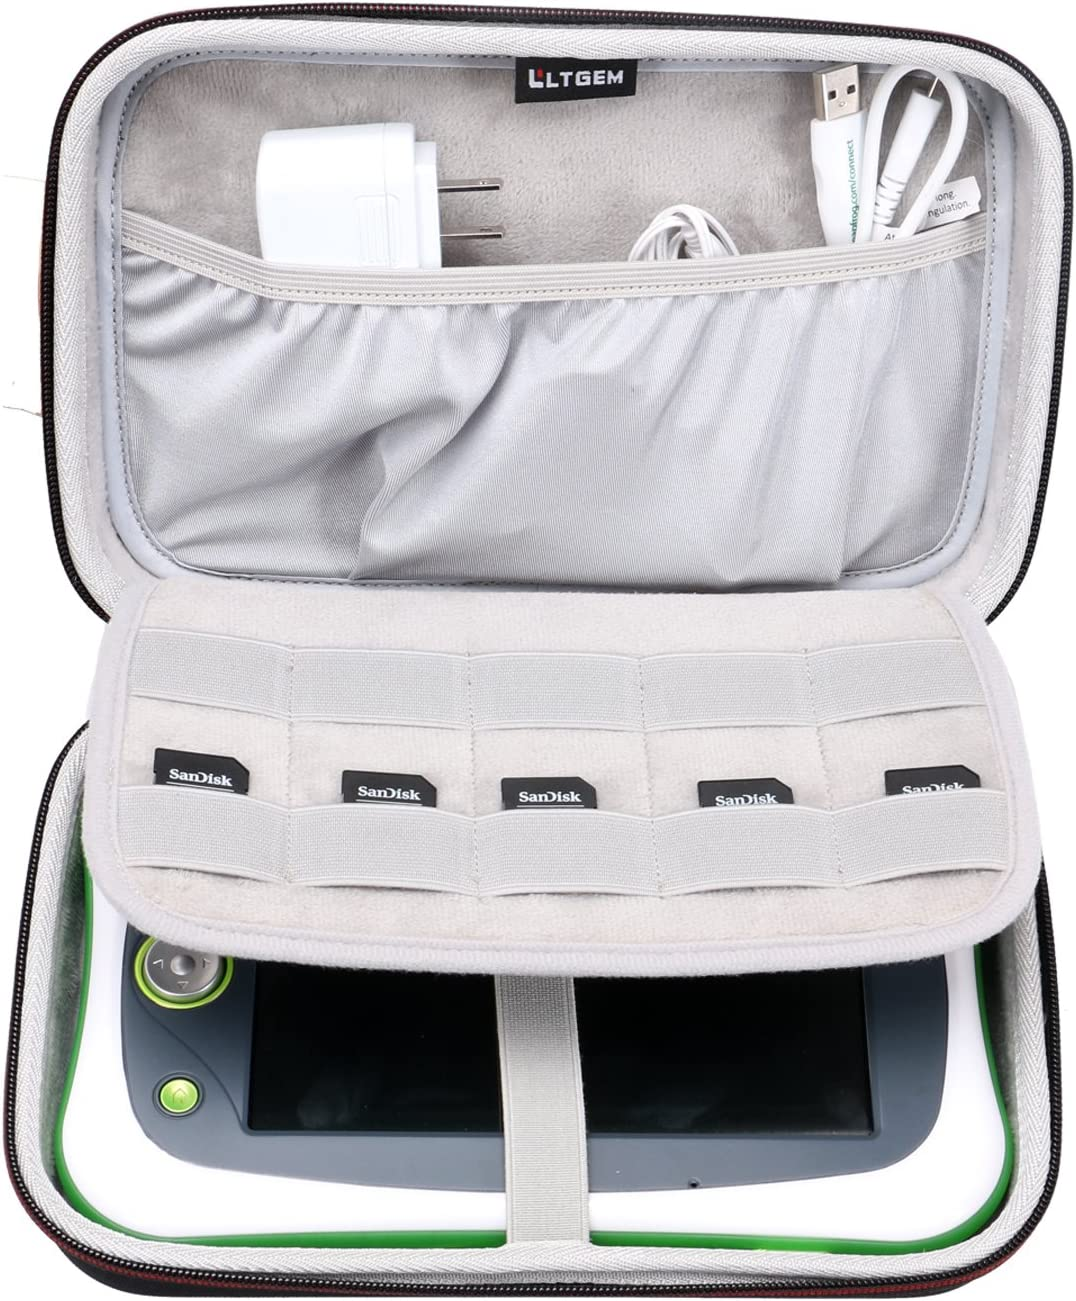 LTGEM EVA Hard Case for Leapfrog LeapPad Ultimate ( Ready for School Tablet ) - Travel Protective Carrying Storage Bag